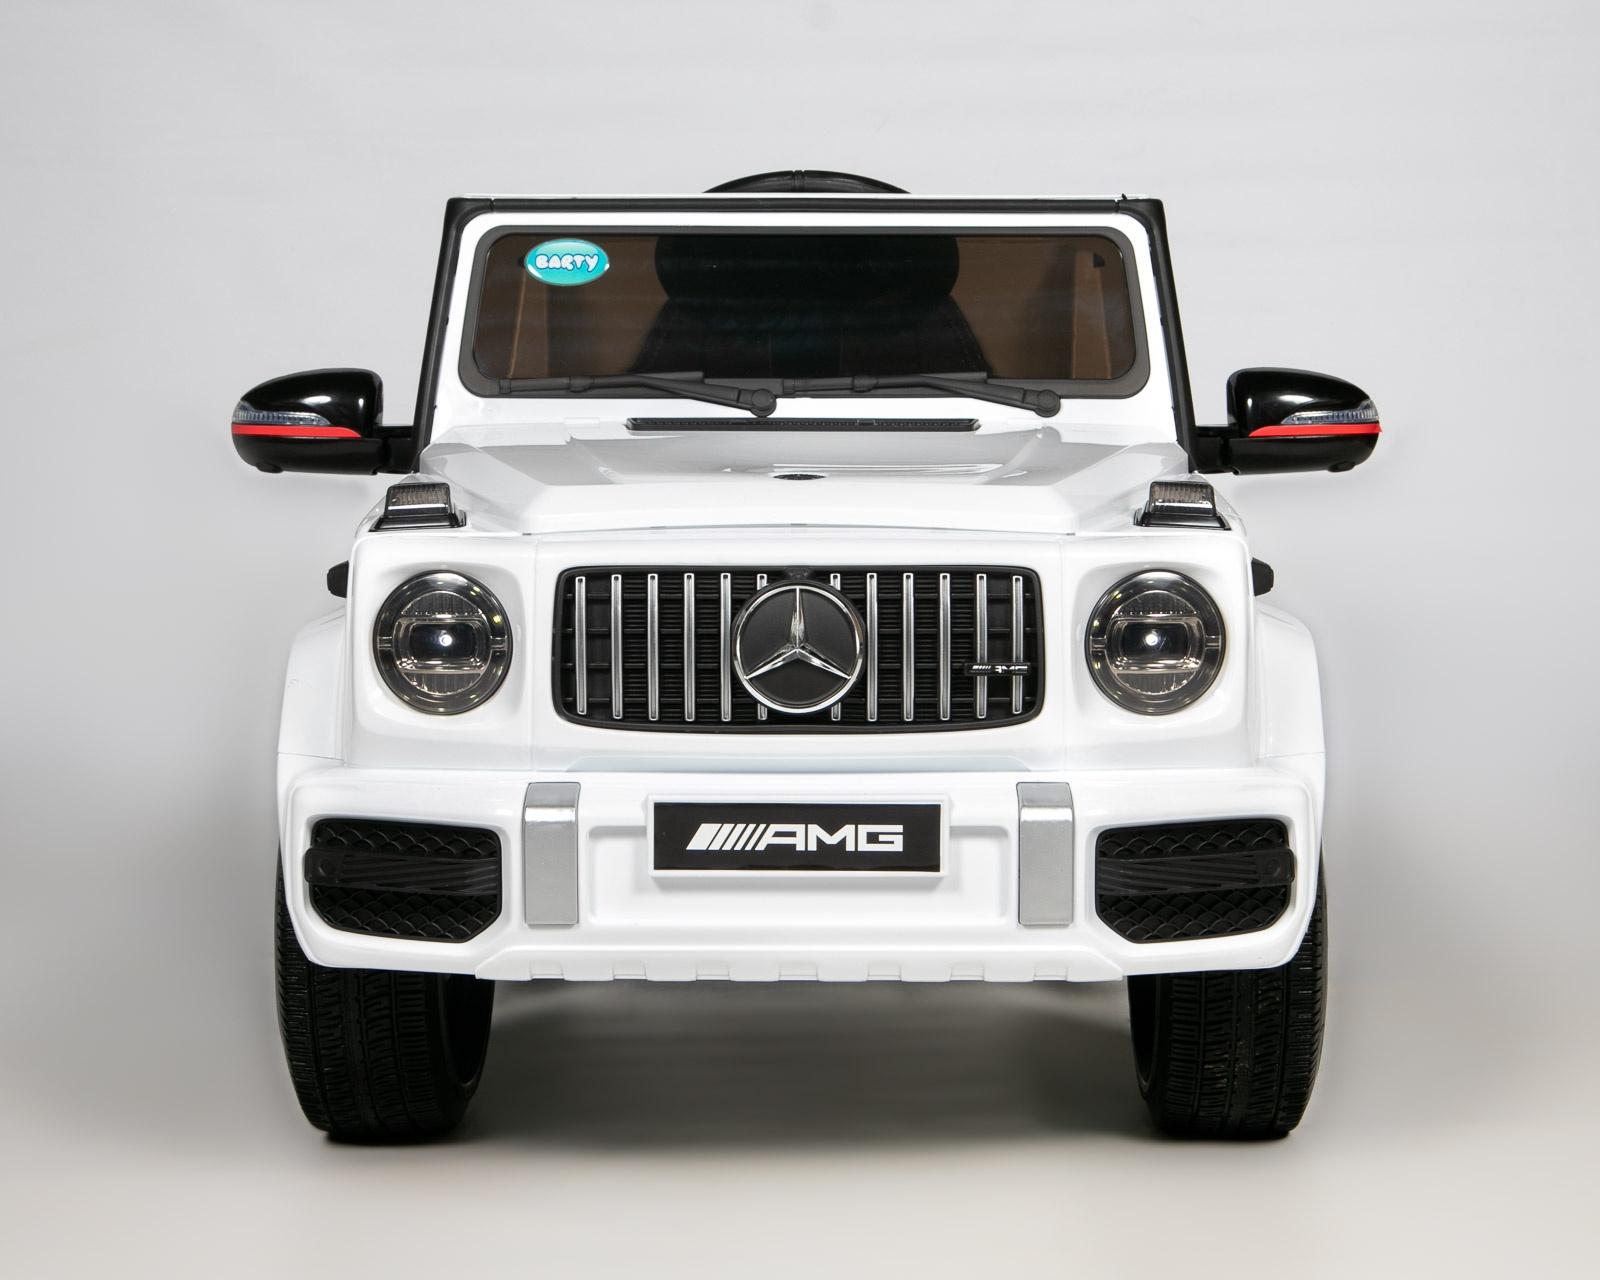 Электромобиль BARTY Mercedes-Benz G63 AMG